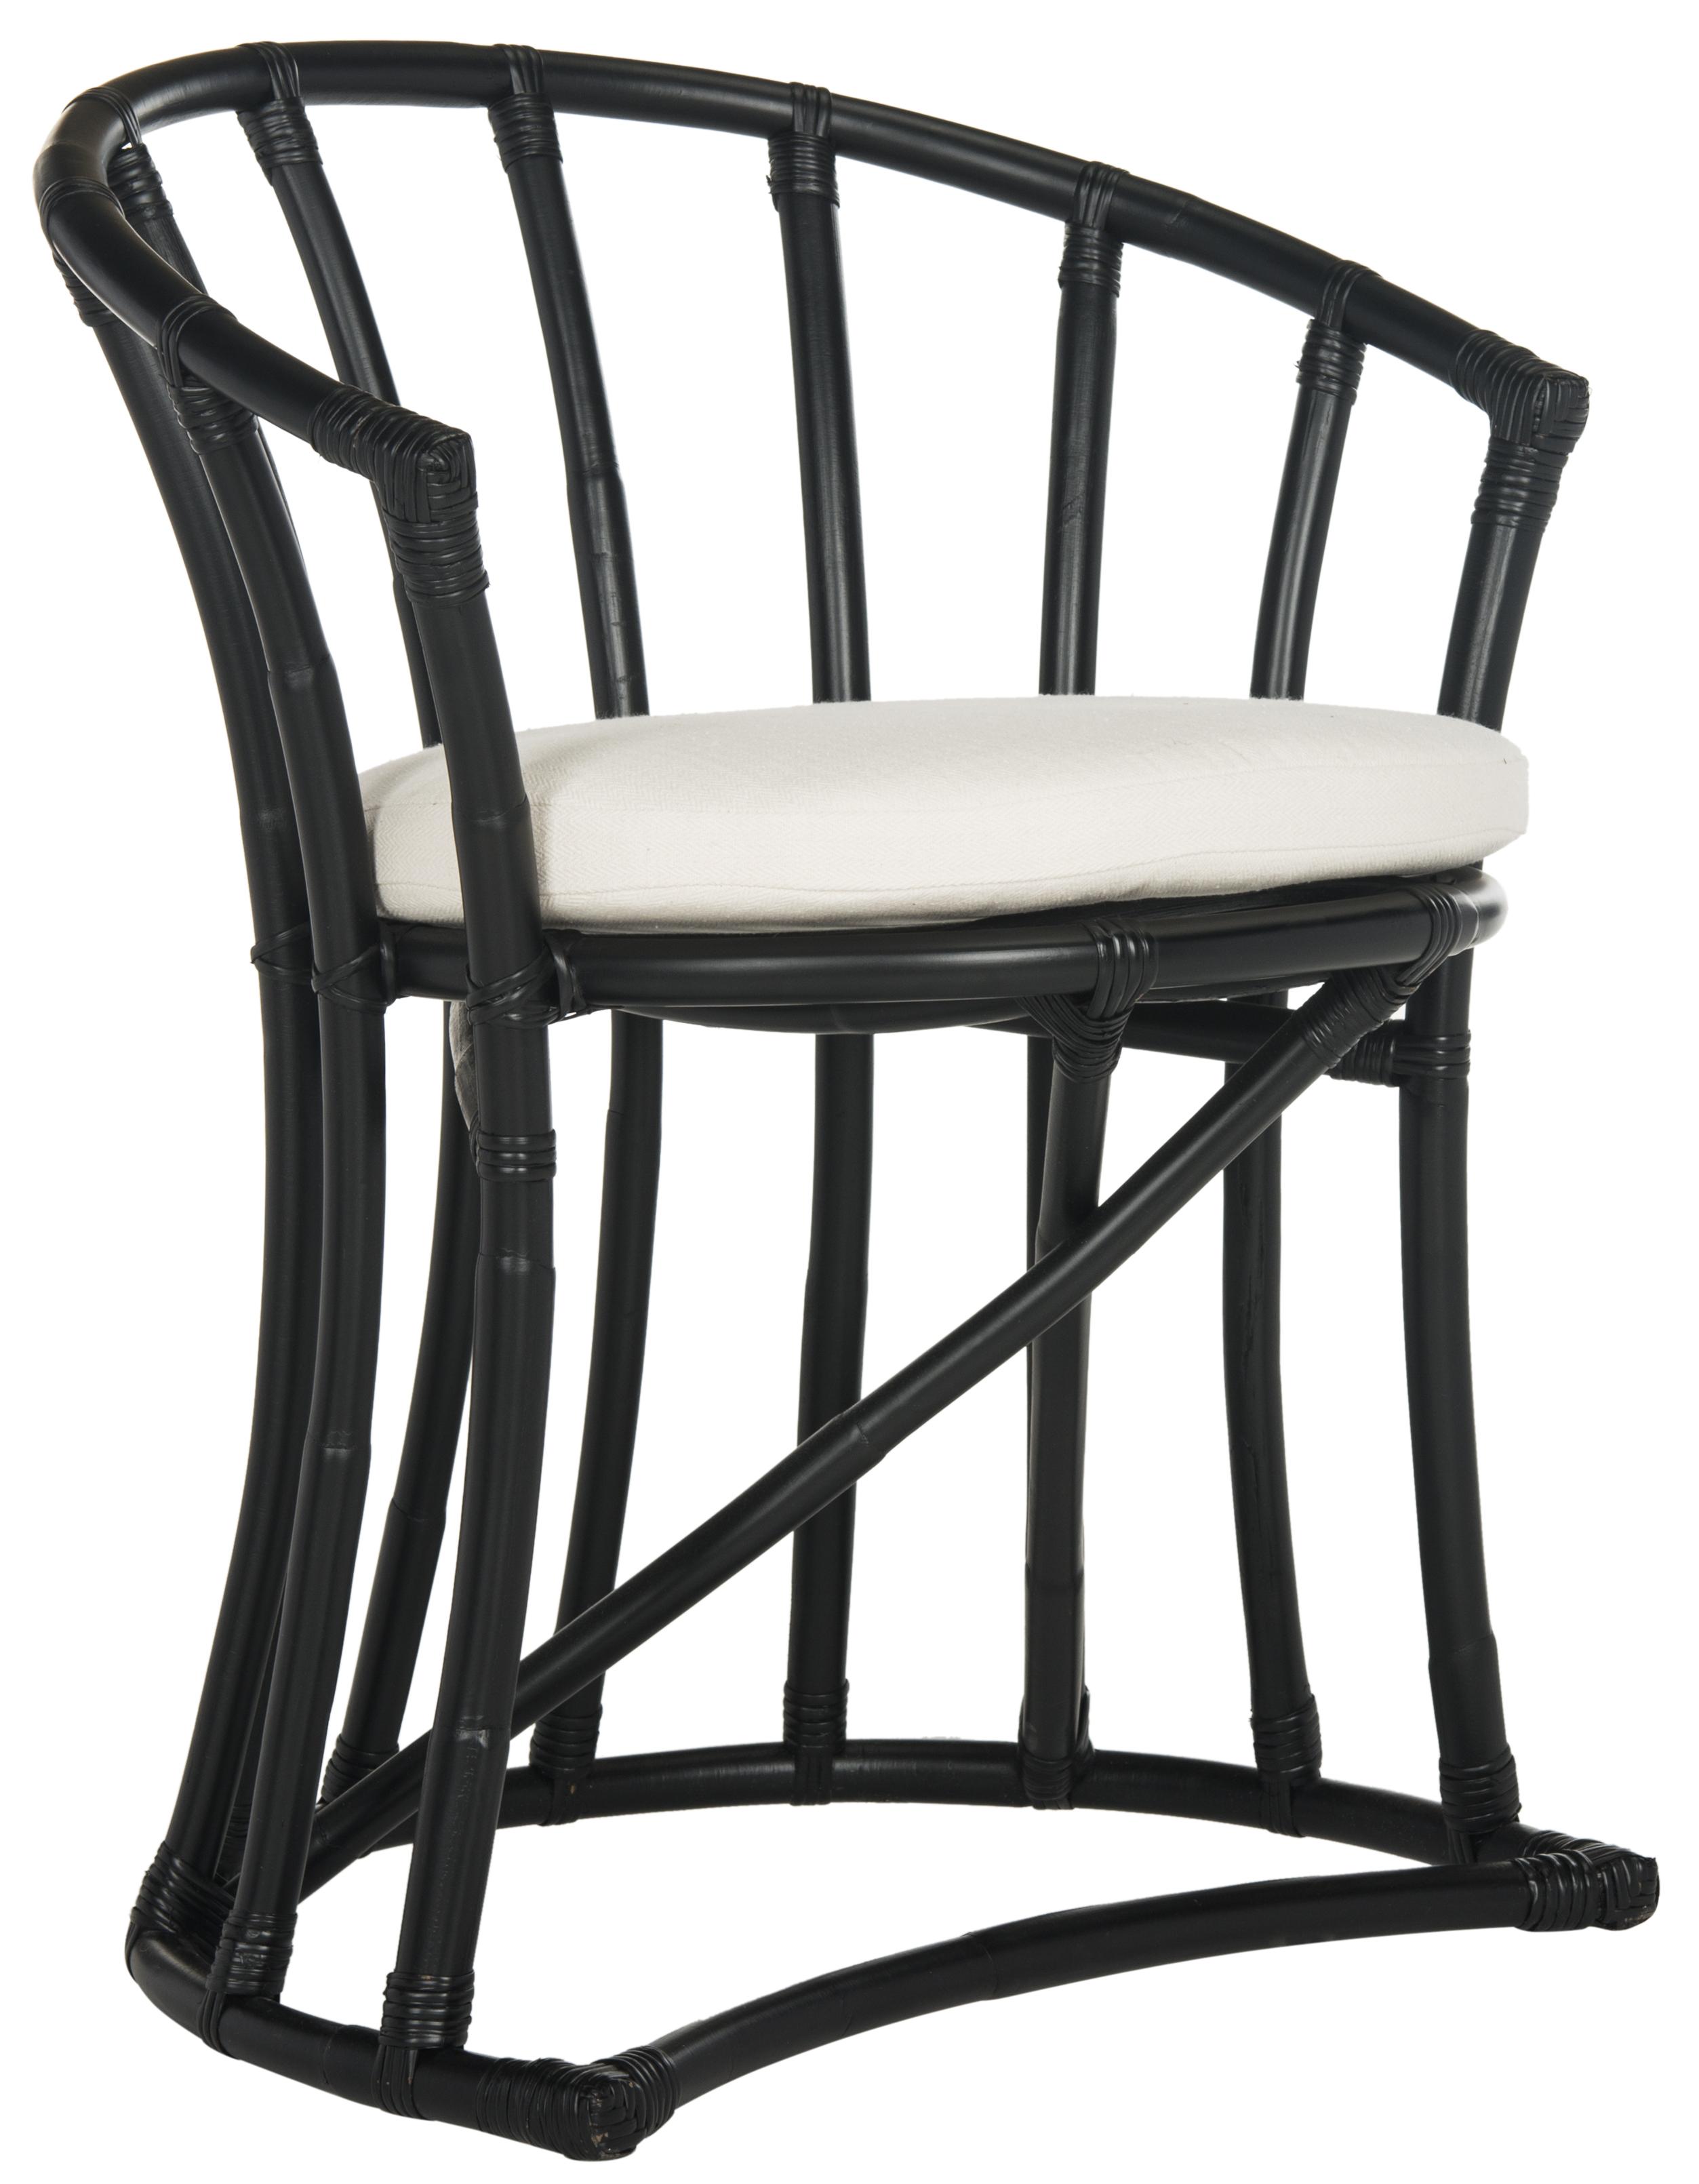 Safavieh Bates Rattan Accent Chair, Black by Safavieh